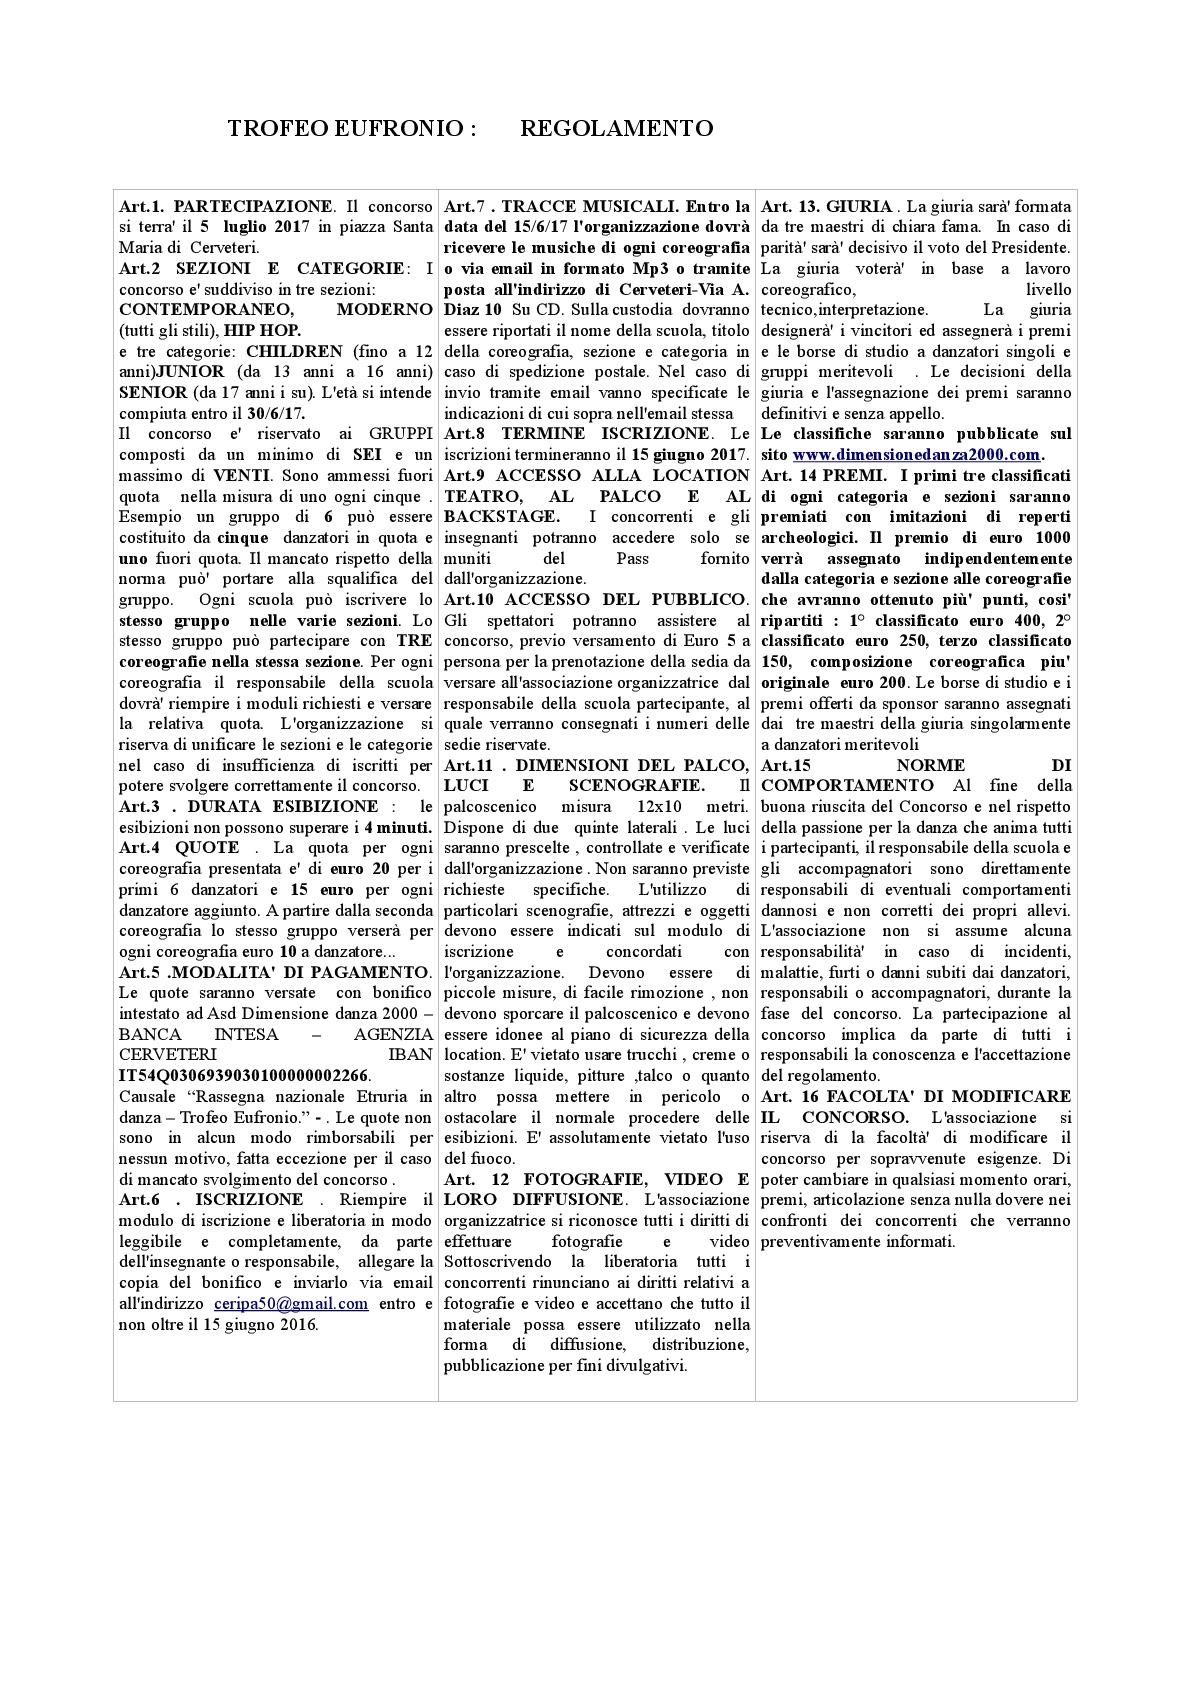 3. regolamento EUFRONIO-001